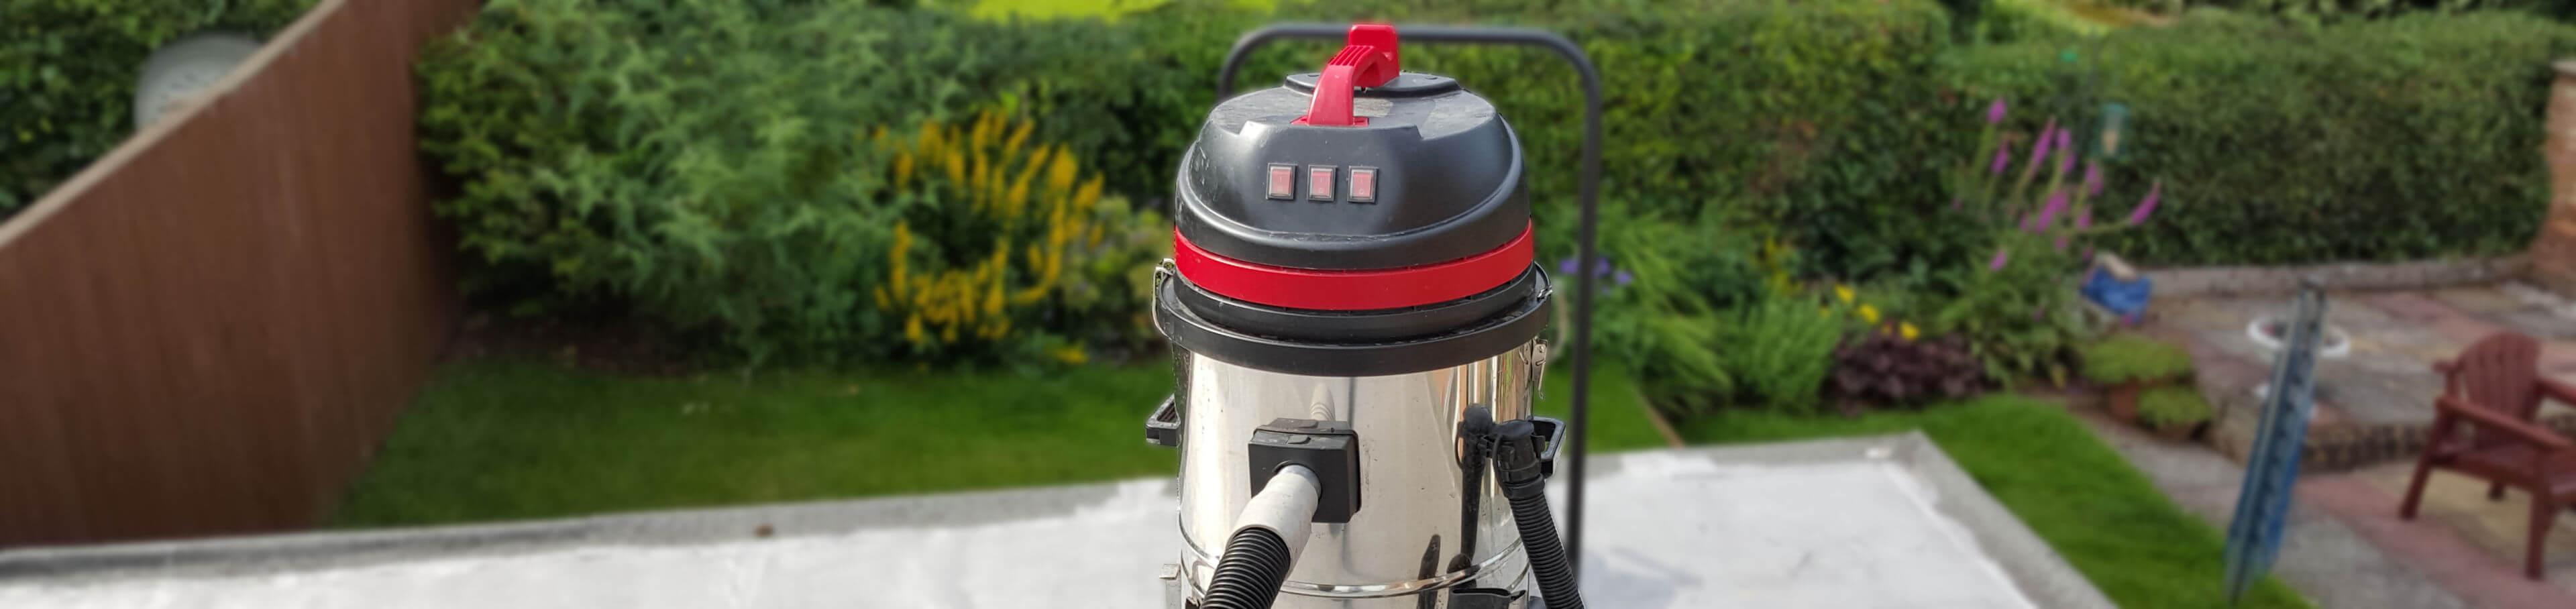 gutter vacuum